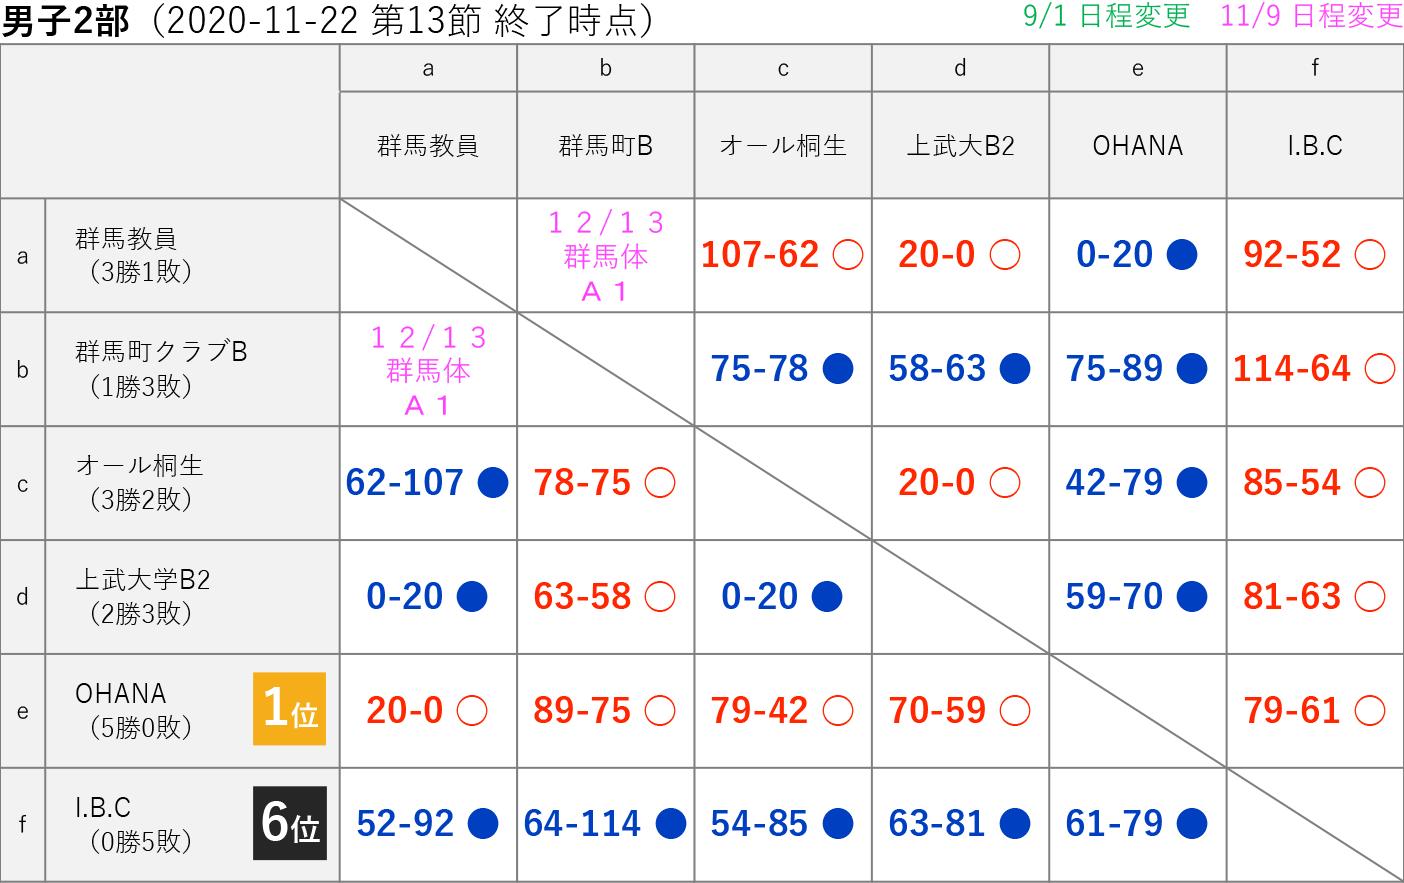 2020社会人リーグ 男子2部 星取り表 2020-11-22(第13節終了時)